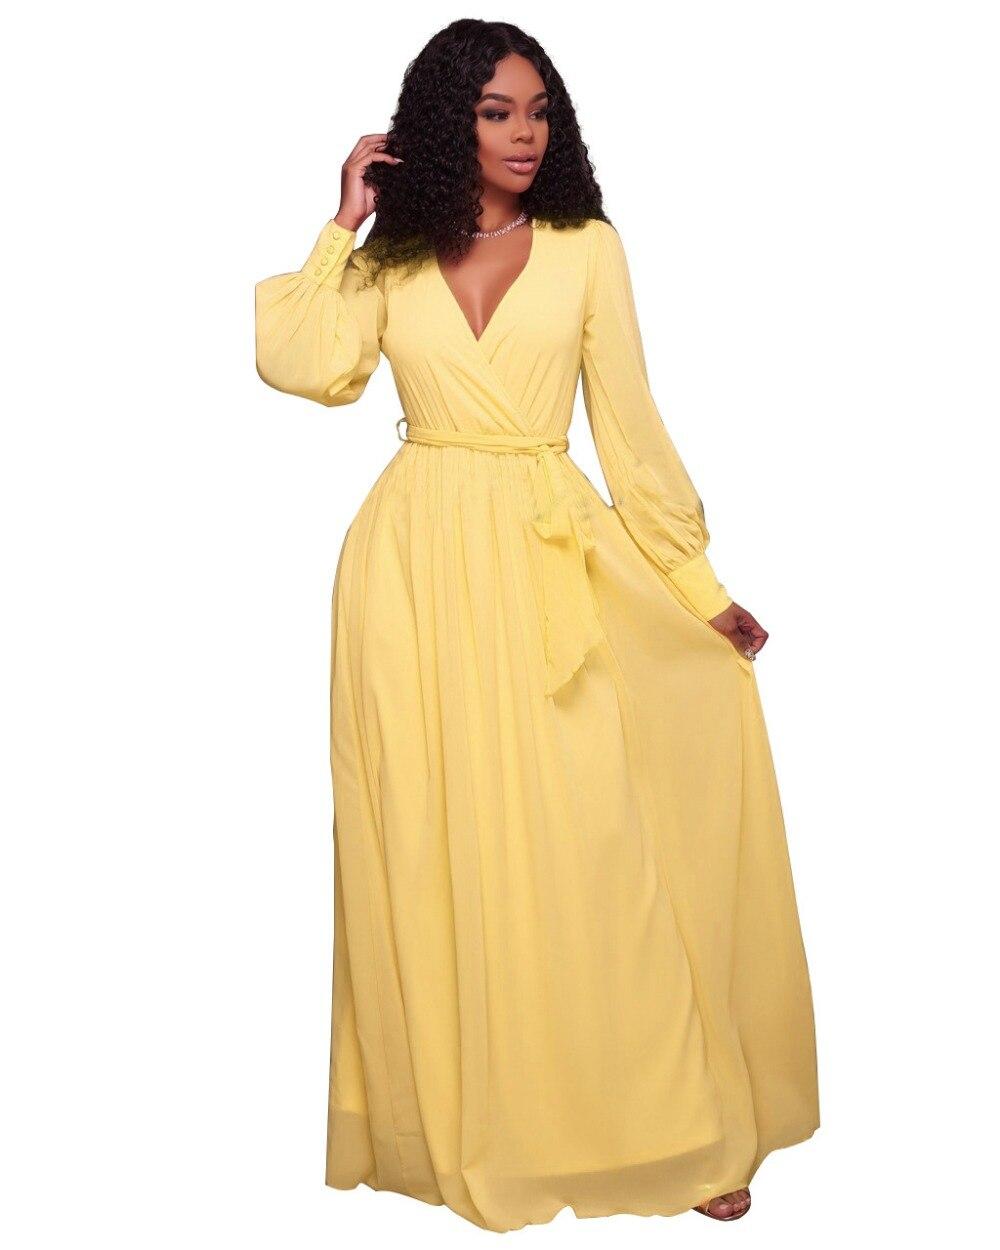 Black dress yellow sash - Aletterhin Long Sleeve Sashes Maxi Dresses Women Elegant Yellow Pink V Neck Ruffles A Line Loose